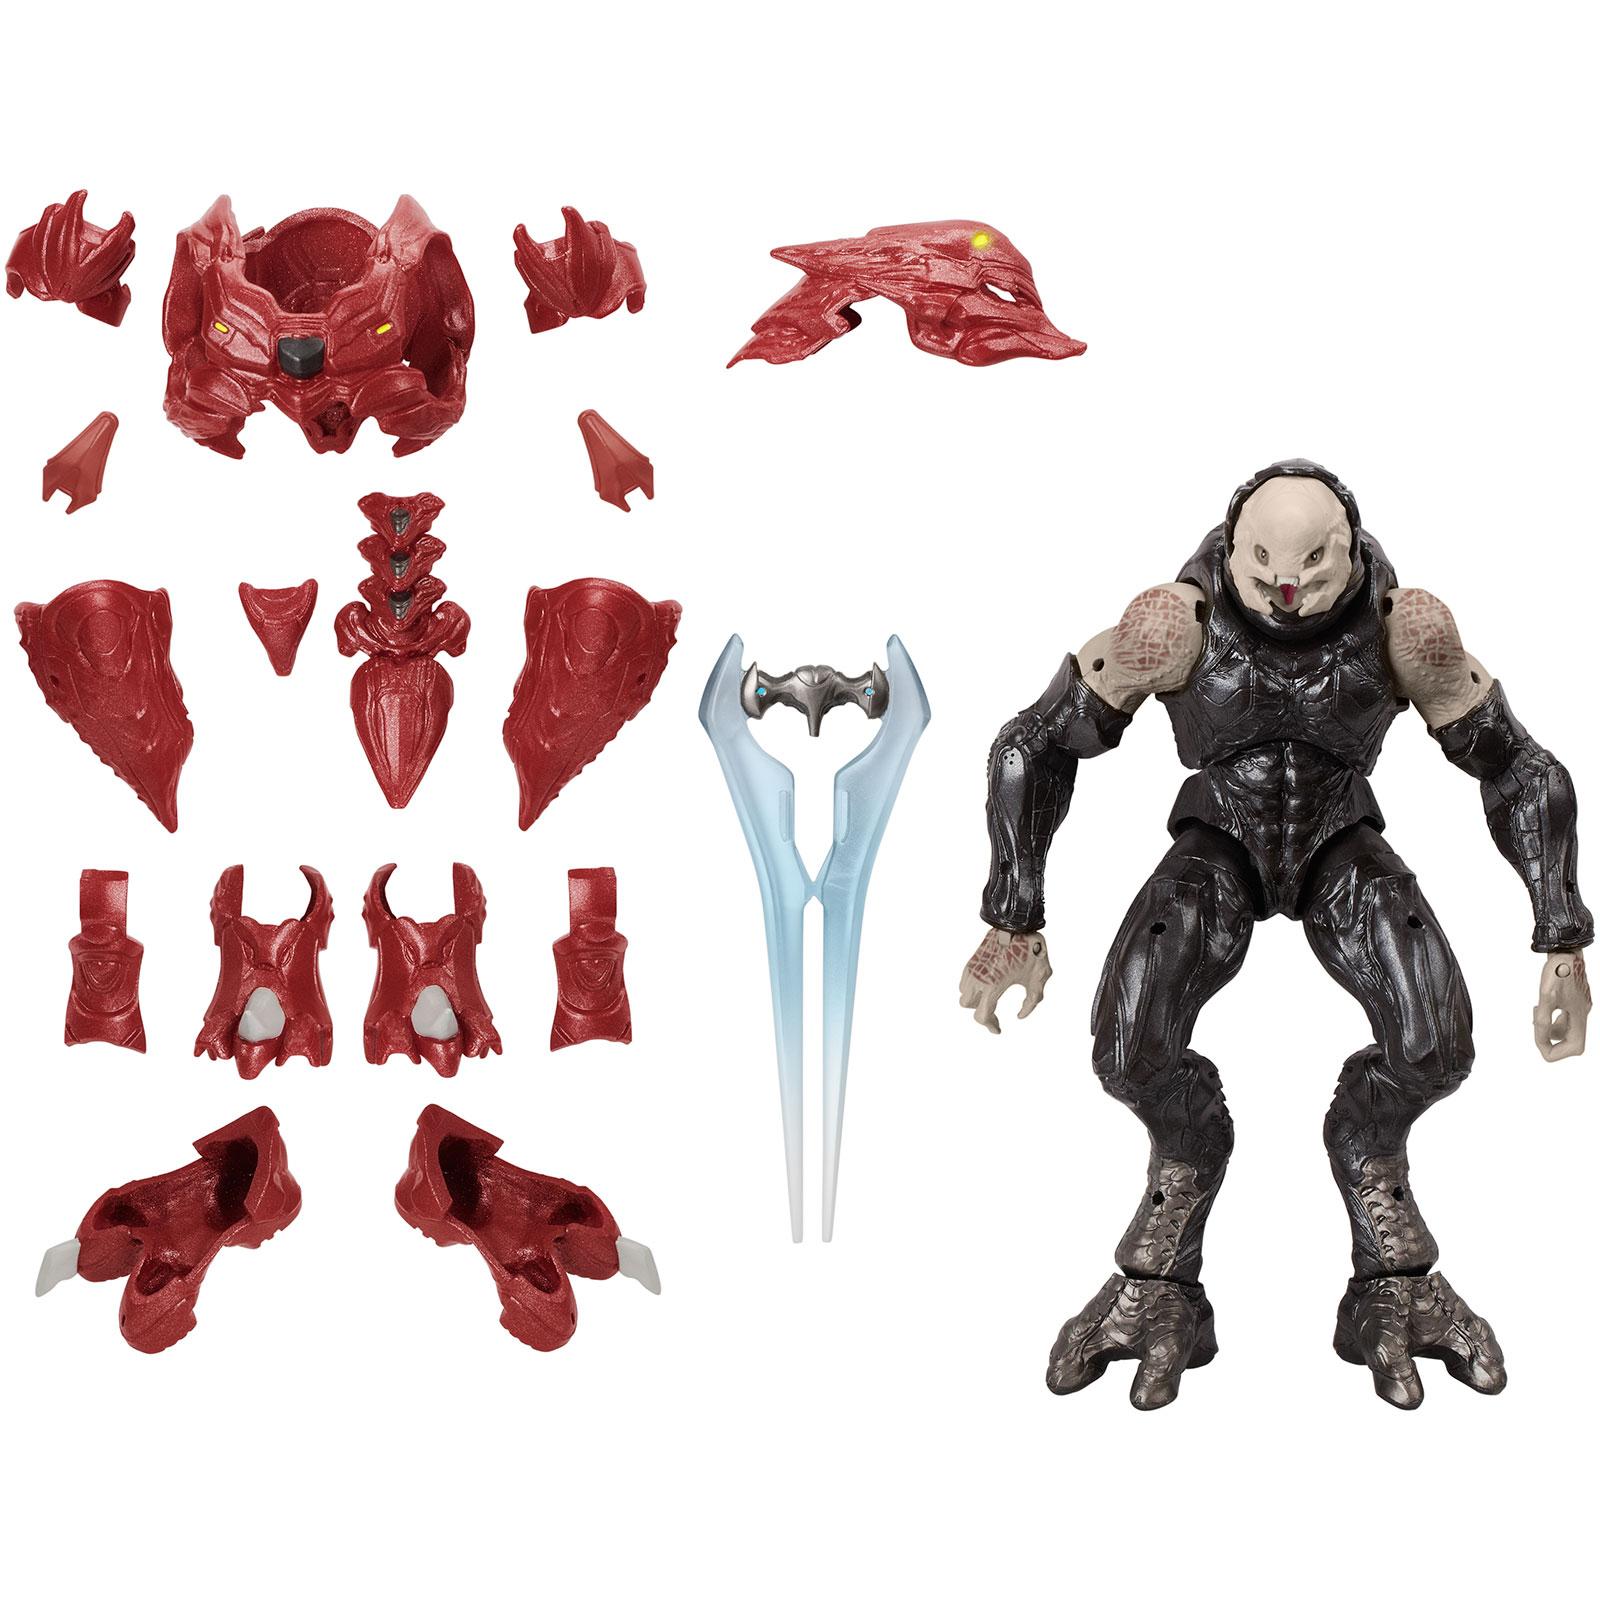 Mattel Halo 6 inch Action Figure - Elite Zealot PartNumber: 004W002775872004P